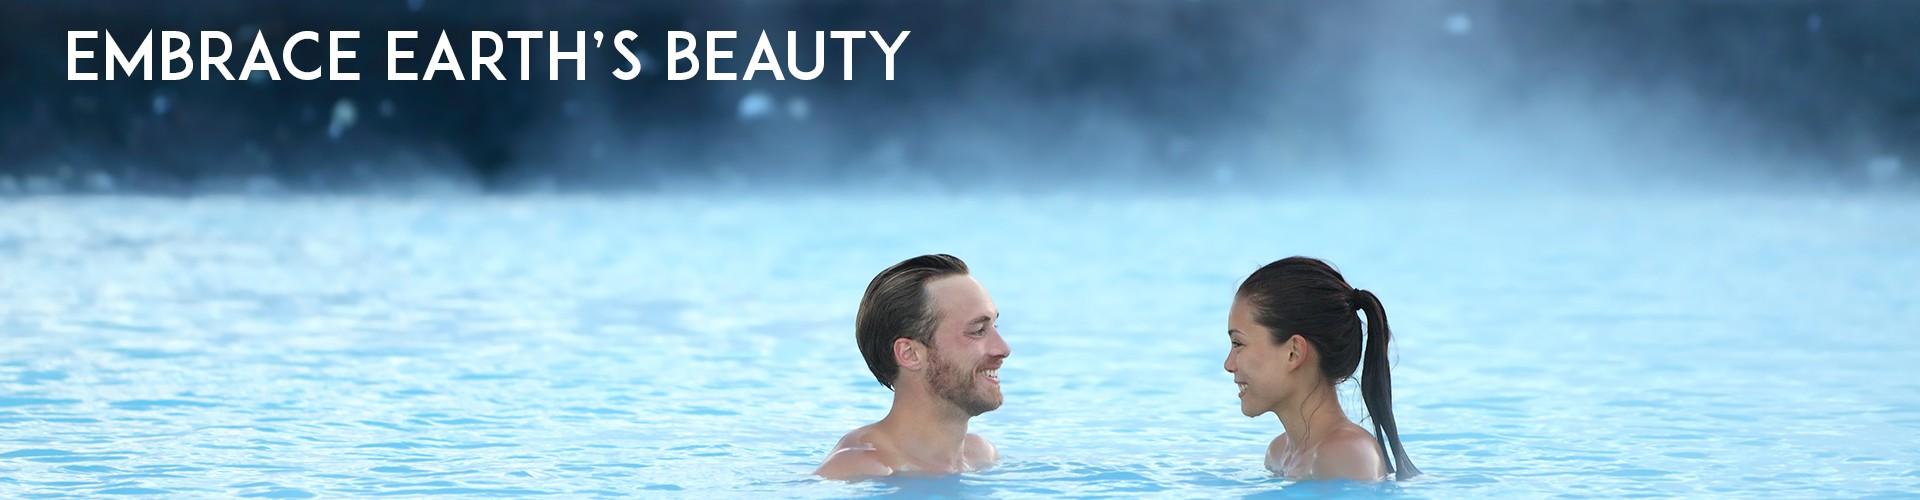 embrace earths beauty